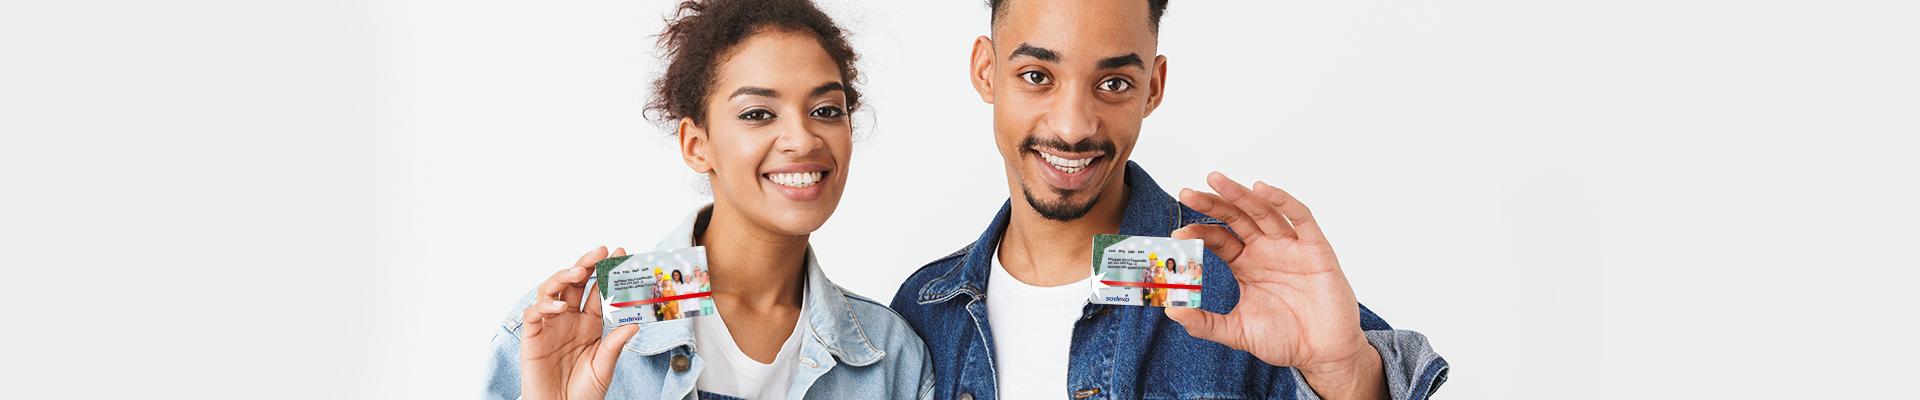 banner-ventajas-de-dotacion-pass